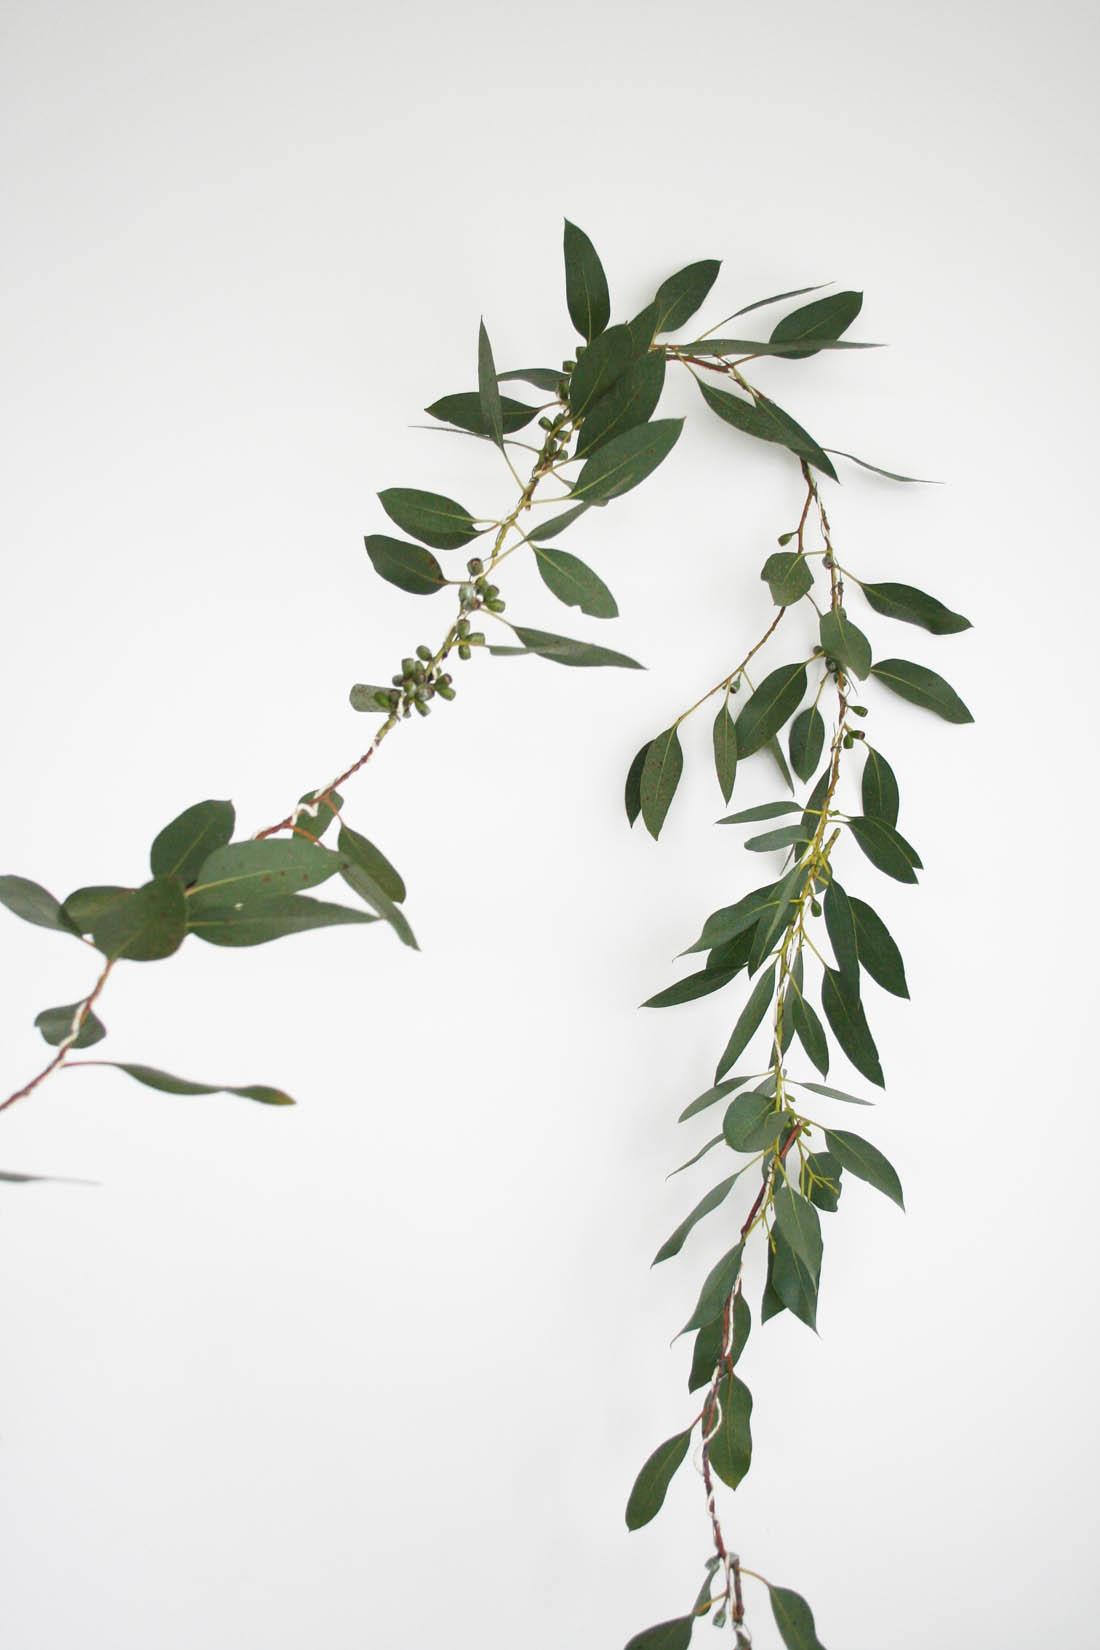 Natural Christmas garland | How to make a Eucalyptus garland | Apartment Apothecary